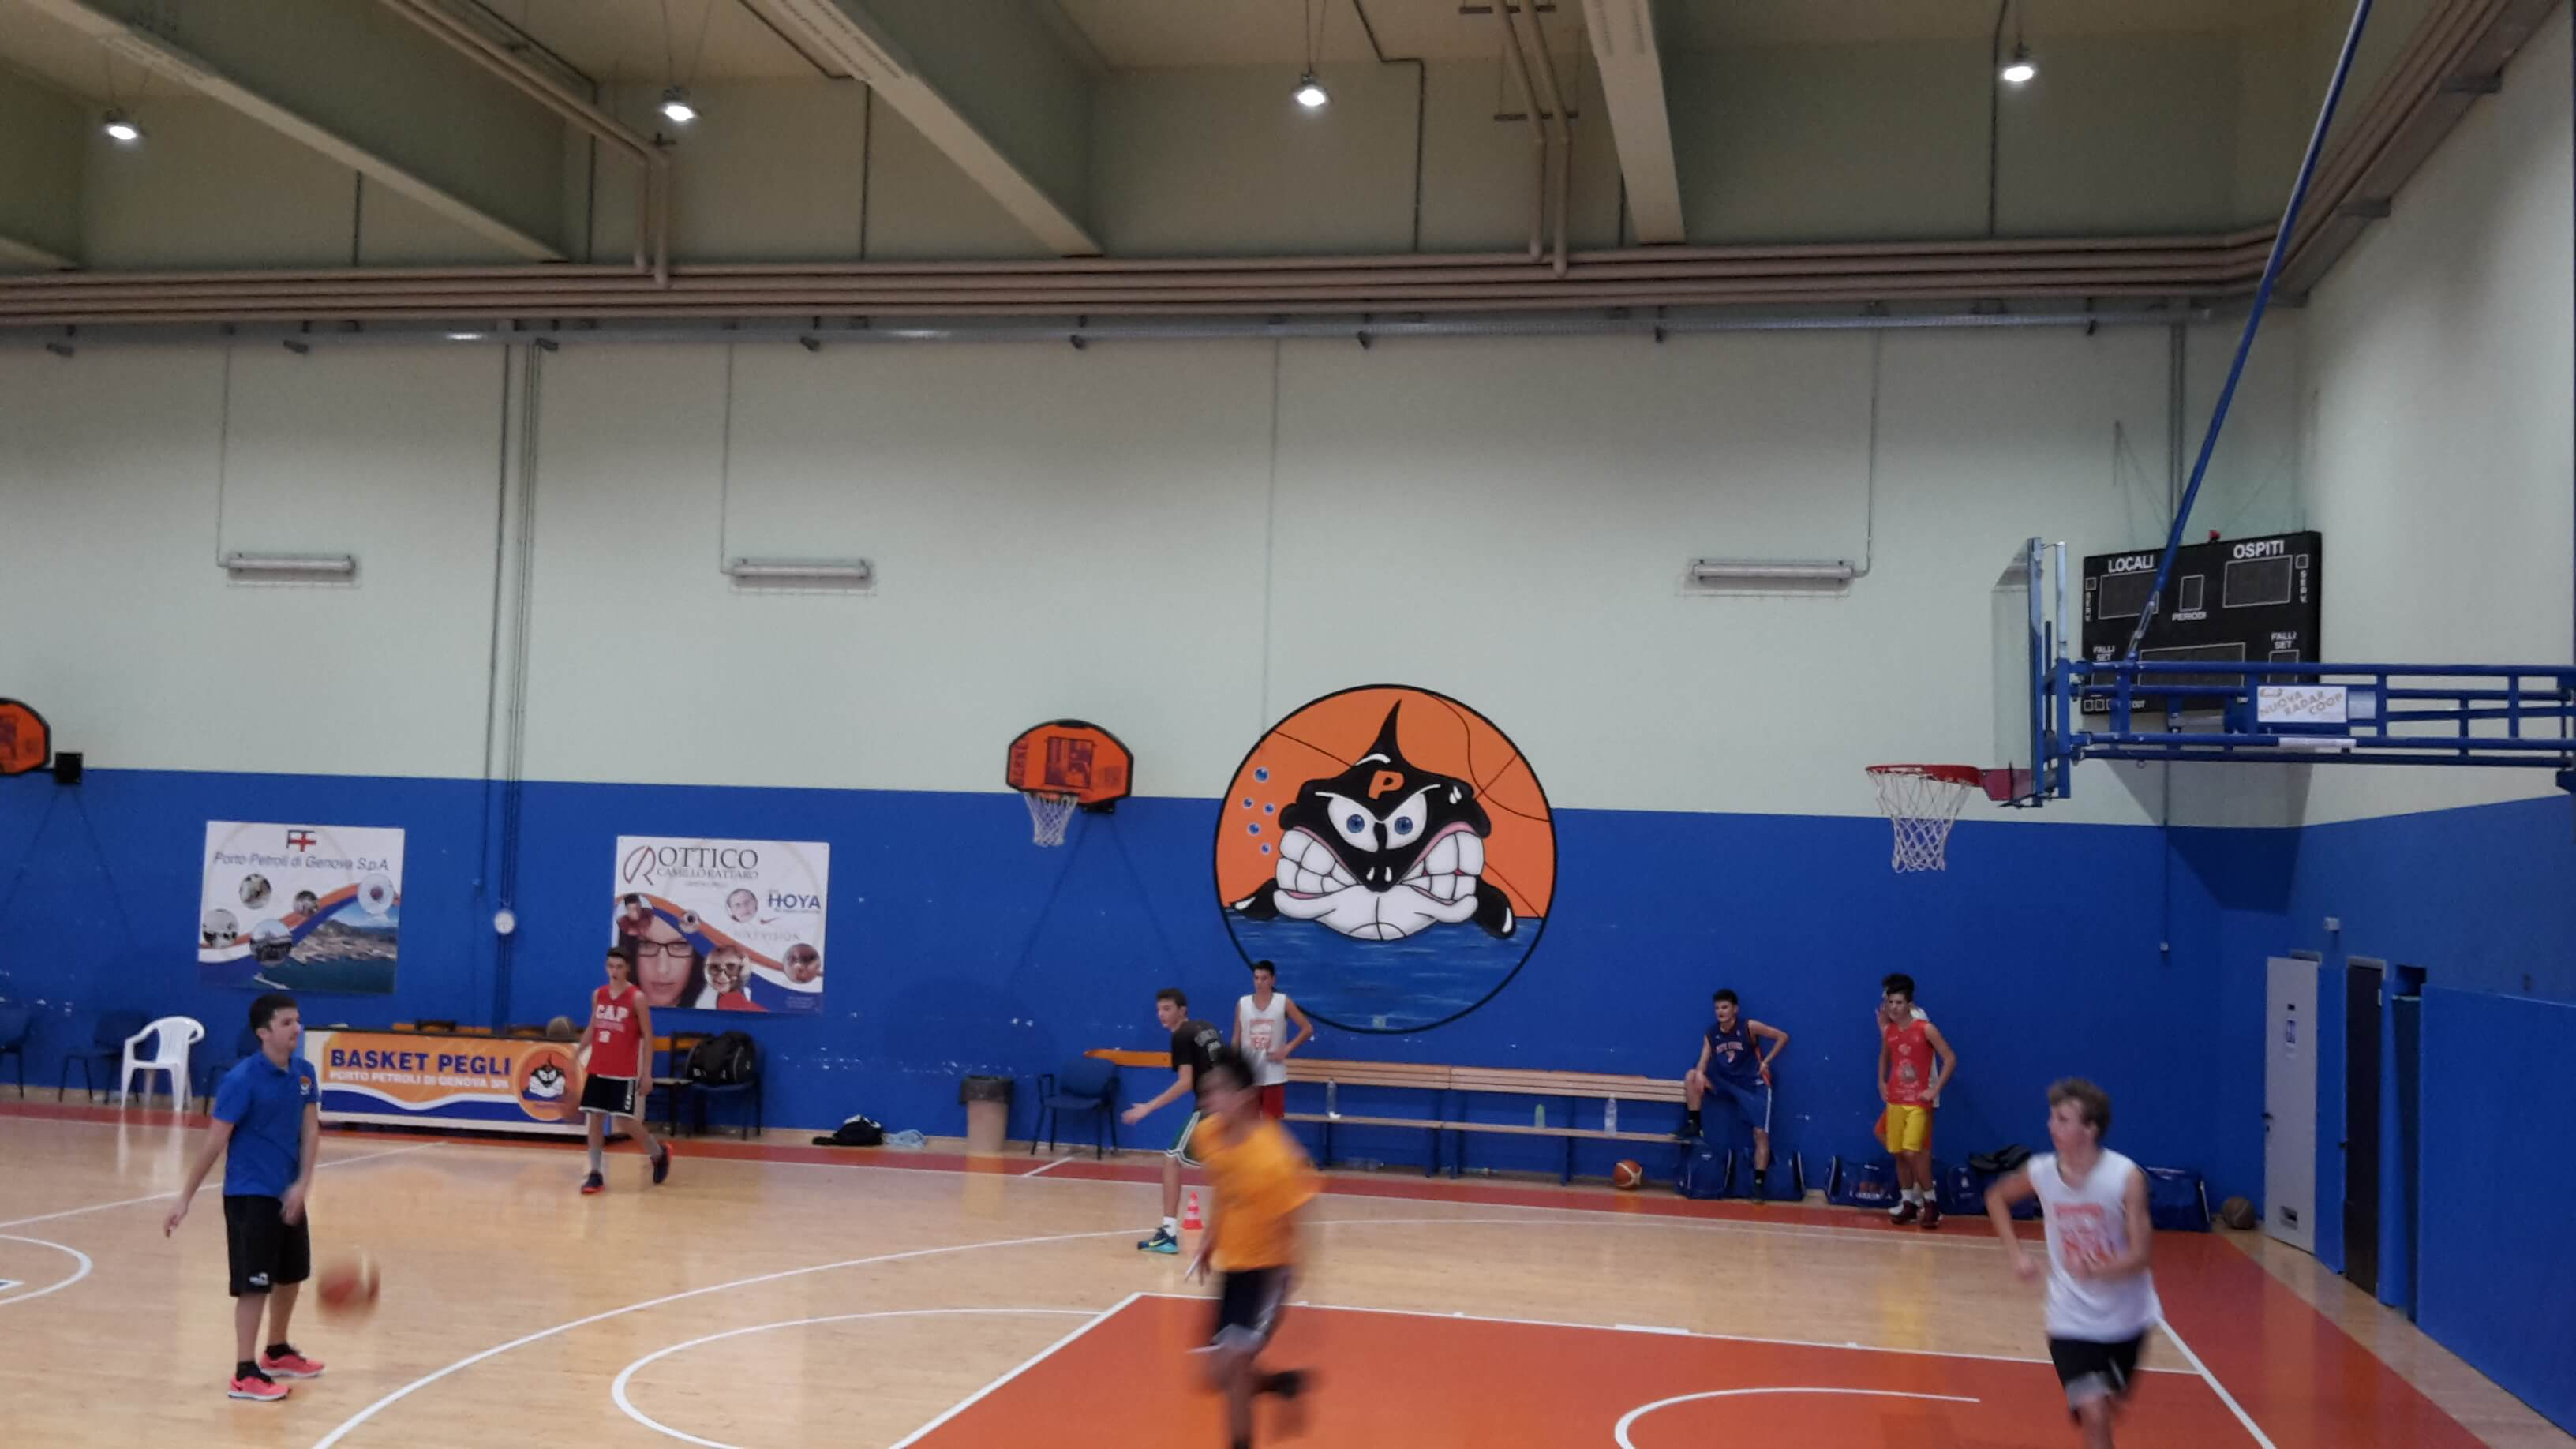 Palasharkers-pegli-palazzetto-per-il-basket-genova-3